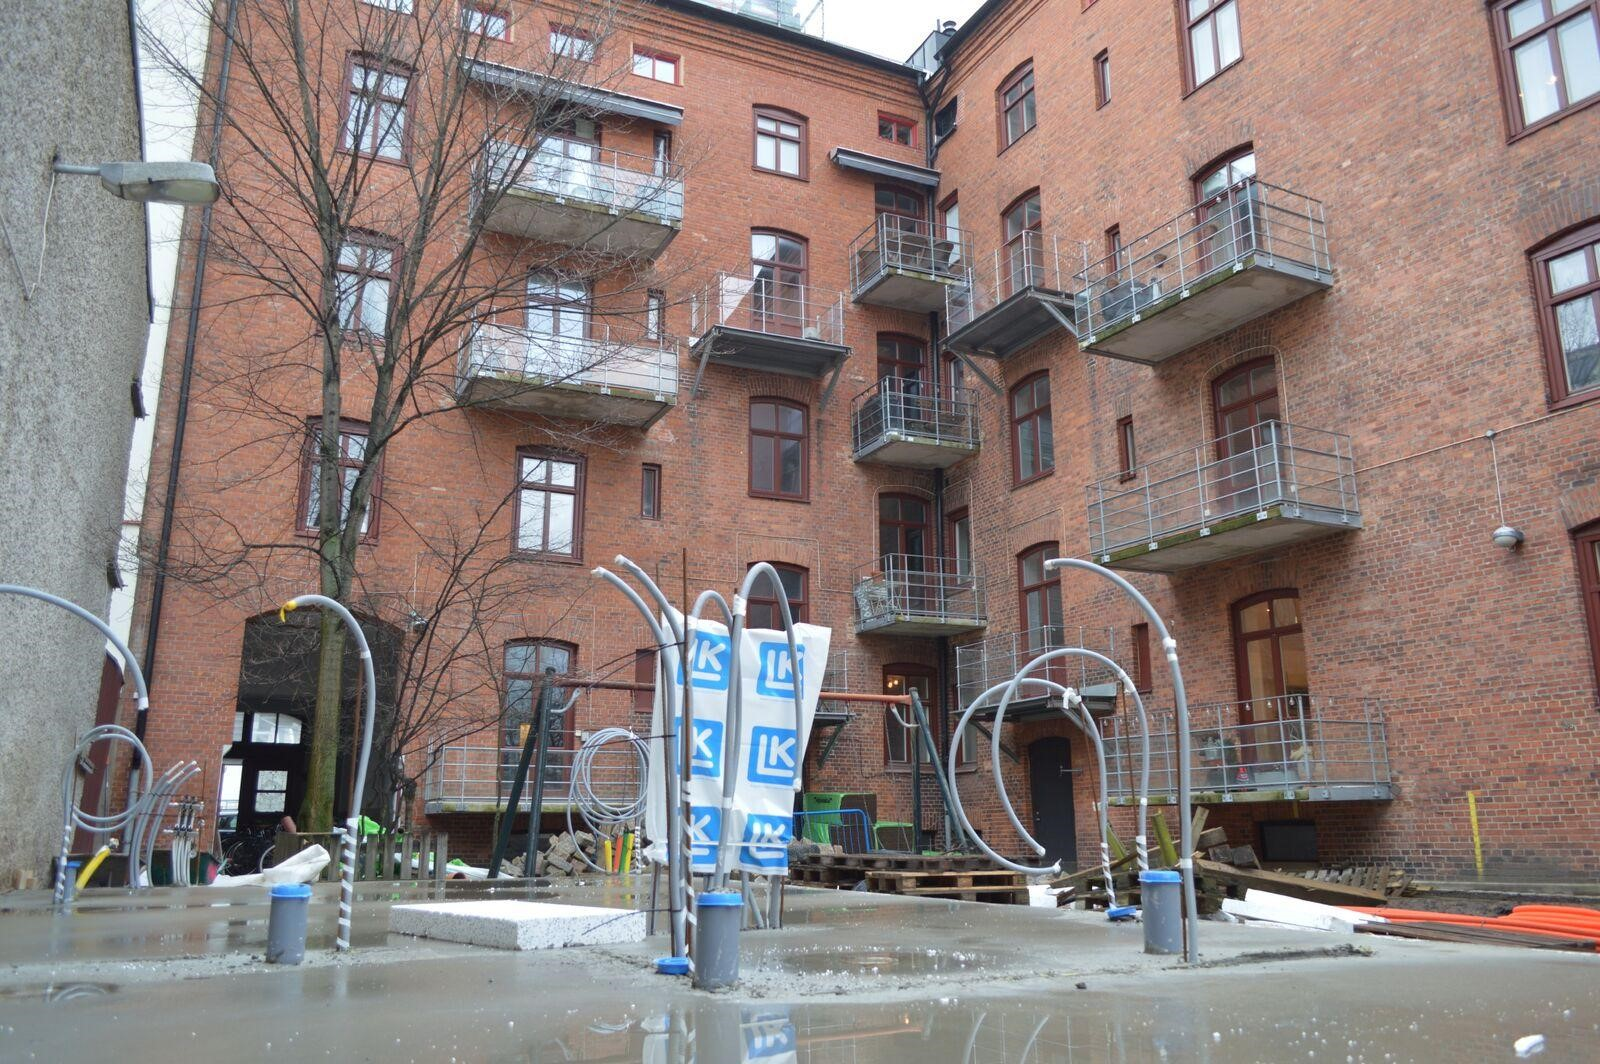 Västgötagatan